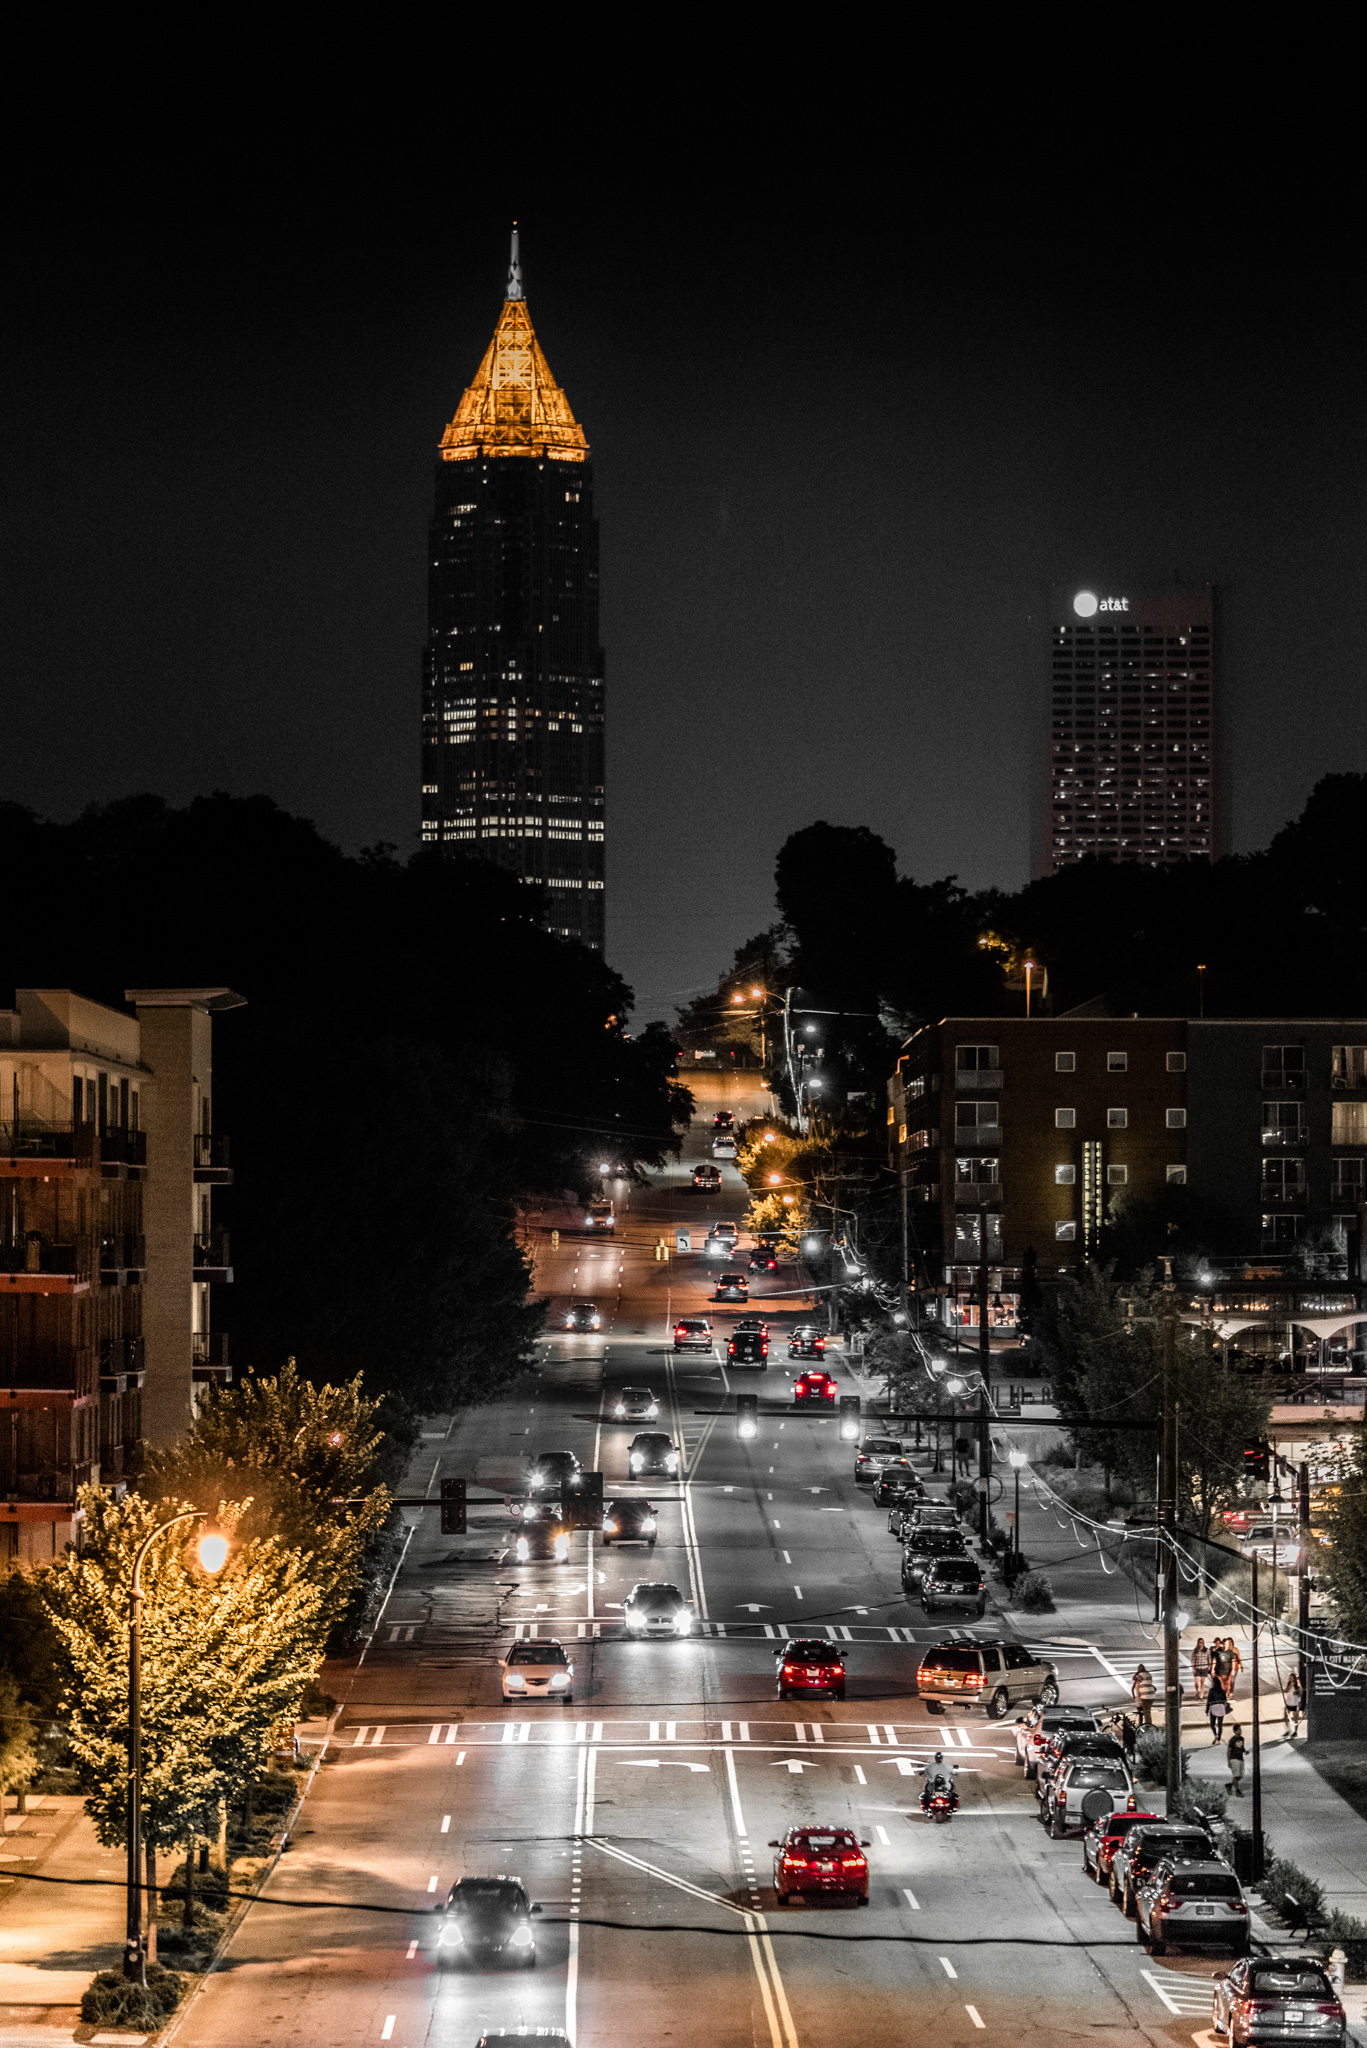 2016-09-10 - Atlanta Lantern Parade - 007